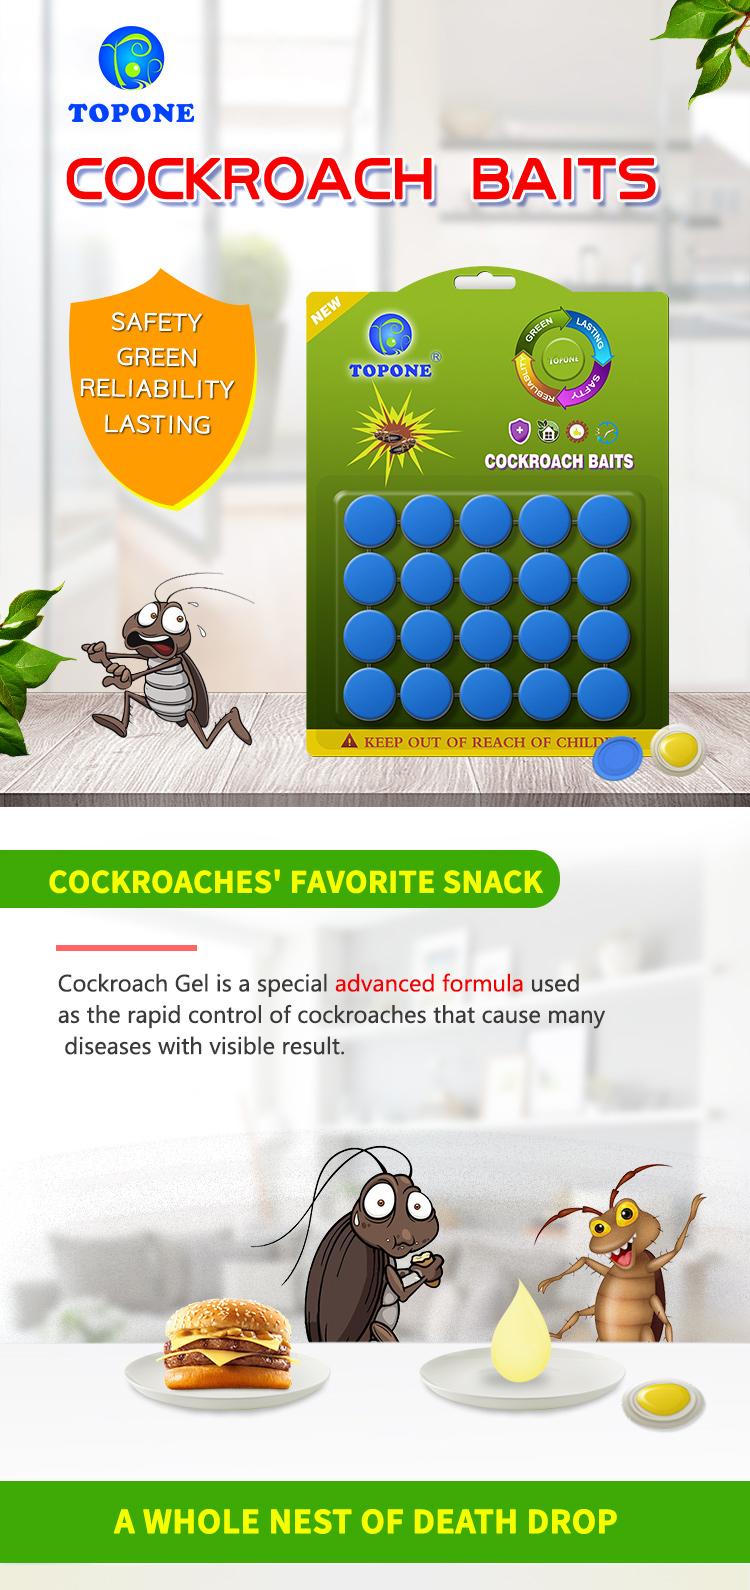 Topone แมลงสาบเหยื่อ strong effect เหนียวกลับสินค้าใหม่